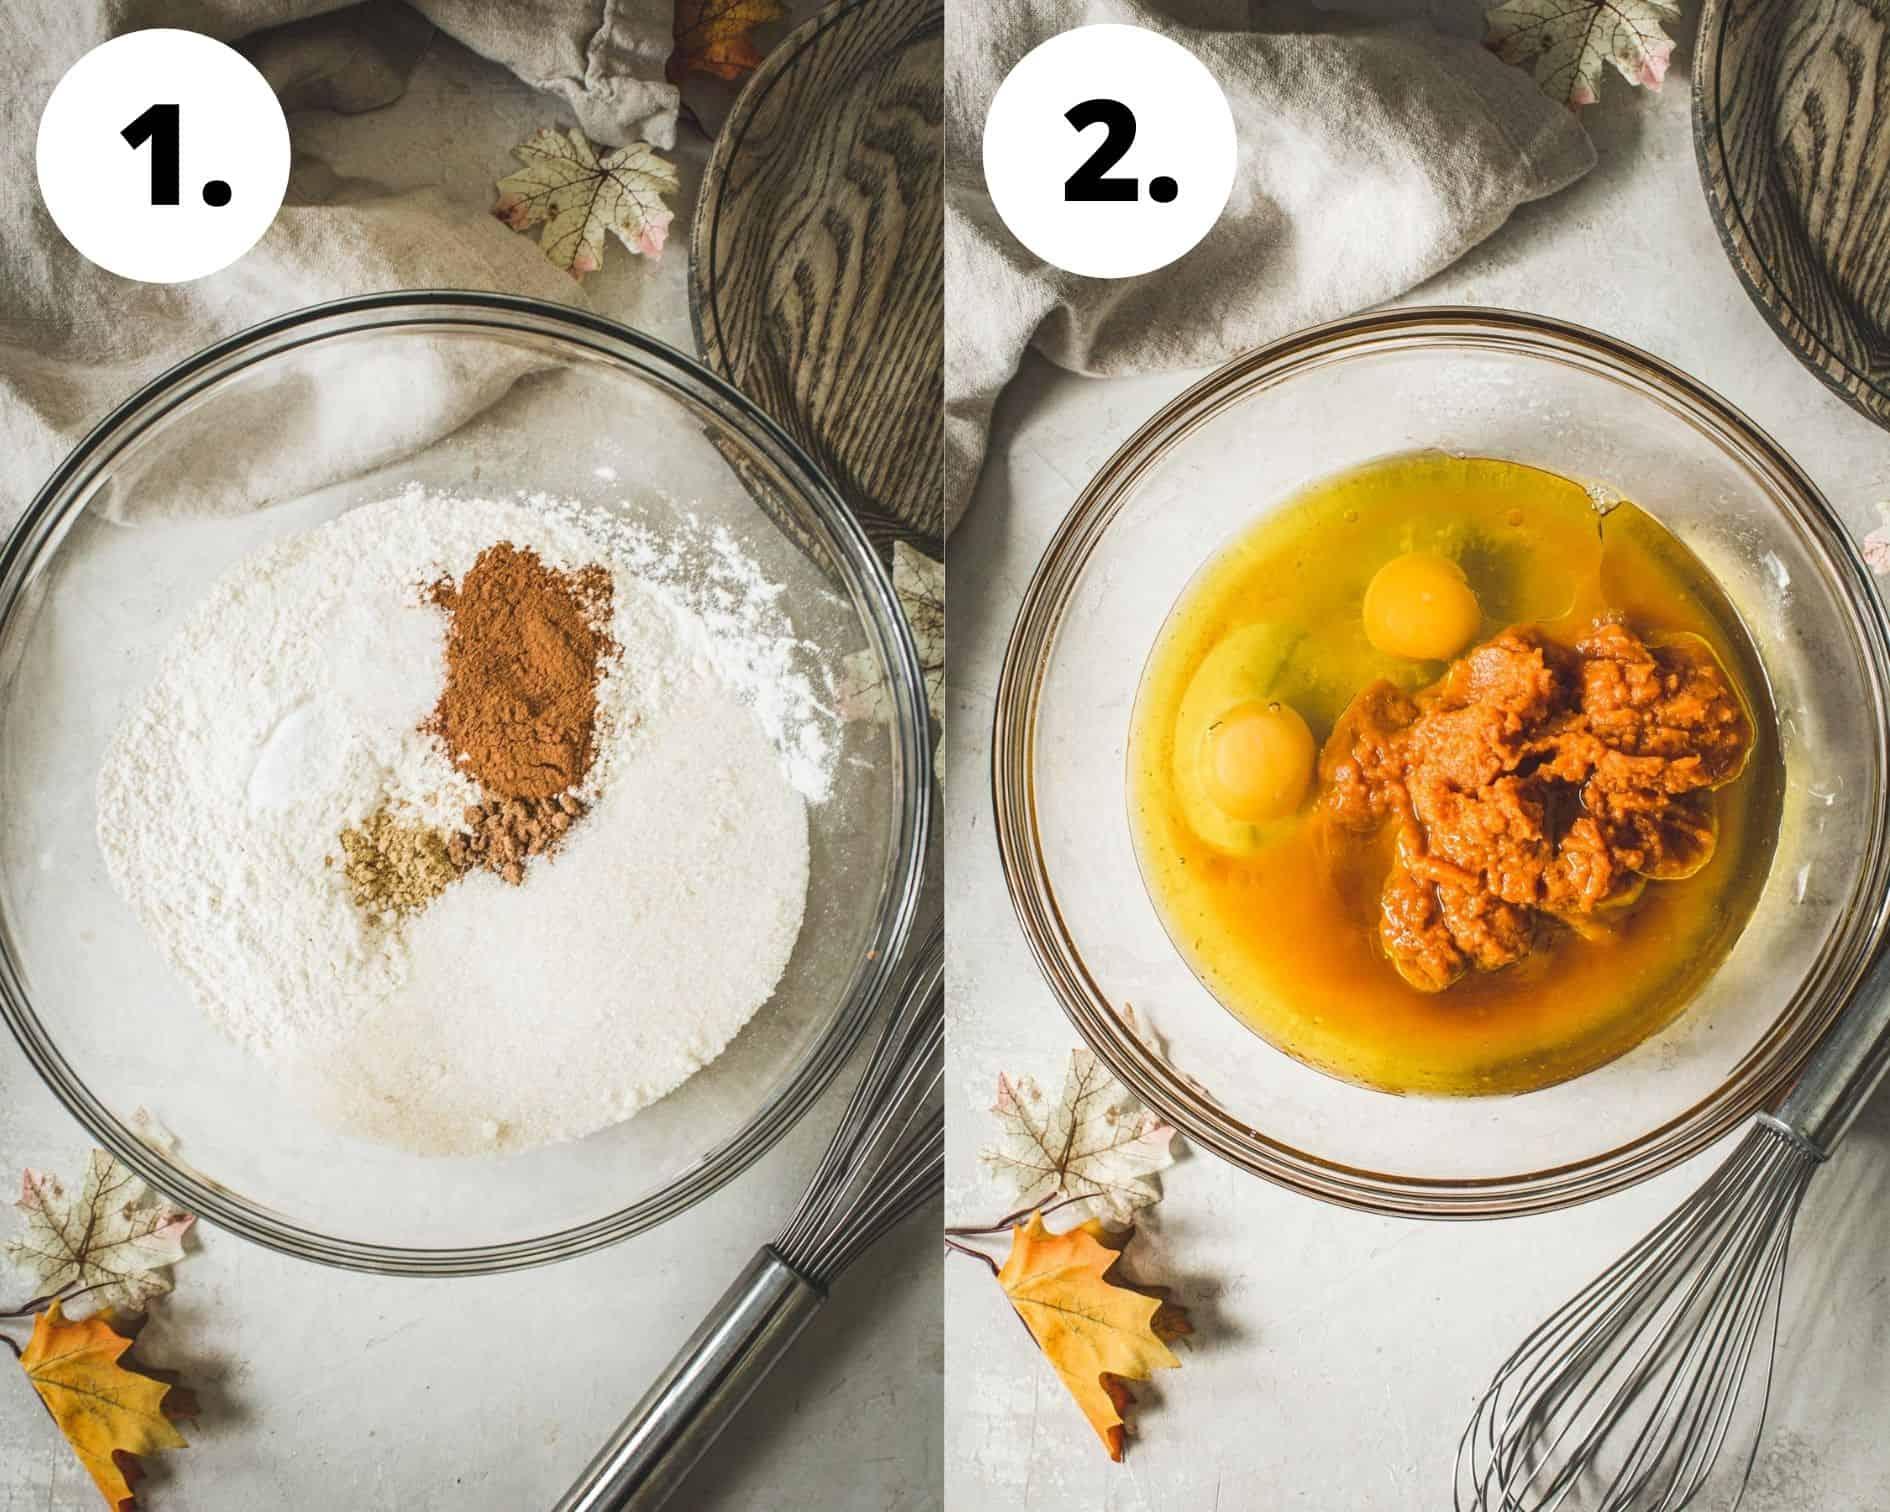 Pumpkin bread process steps 1 and 2.